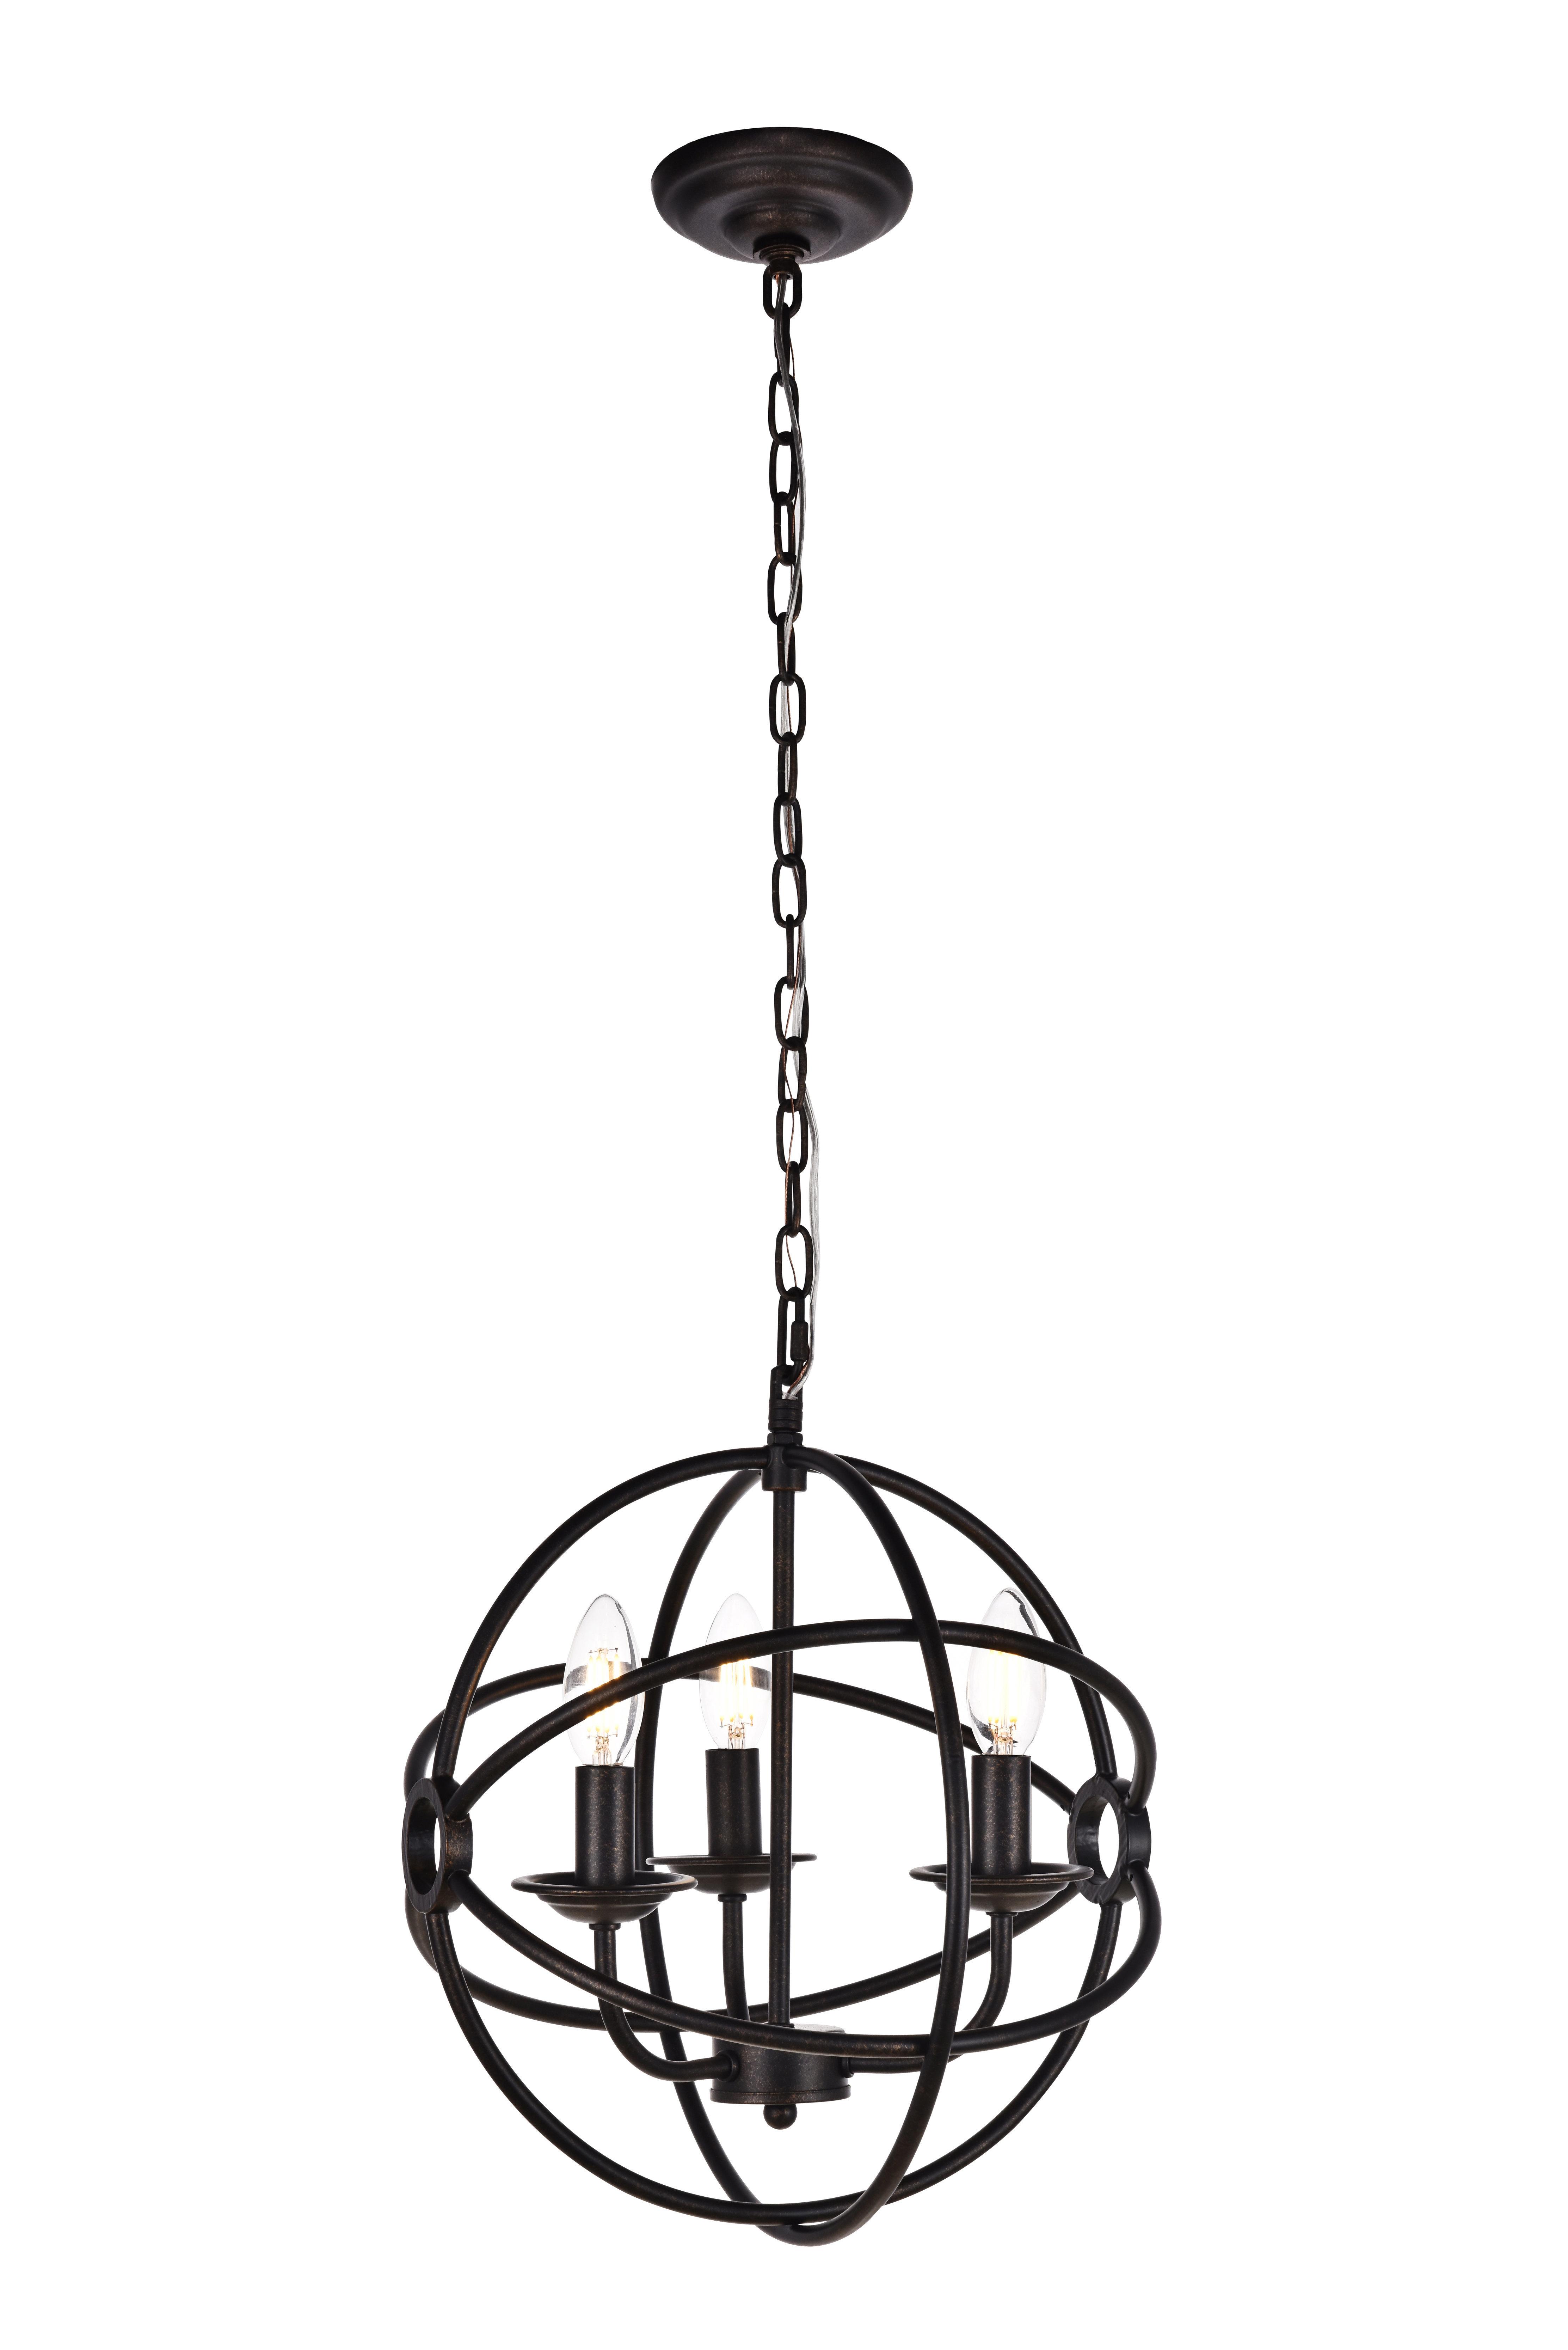 Shipststour 3 Light Globe Chandelier With Regard To Shipststour 3 Light Globe Chandeliers (View 29 of 30)